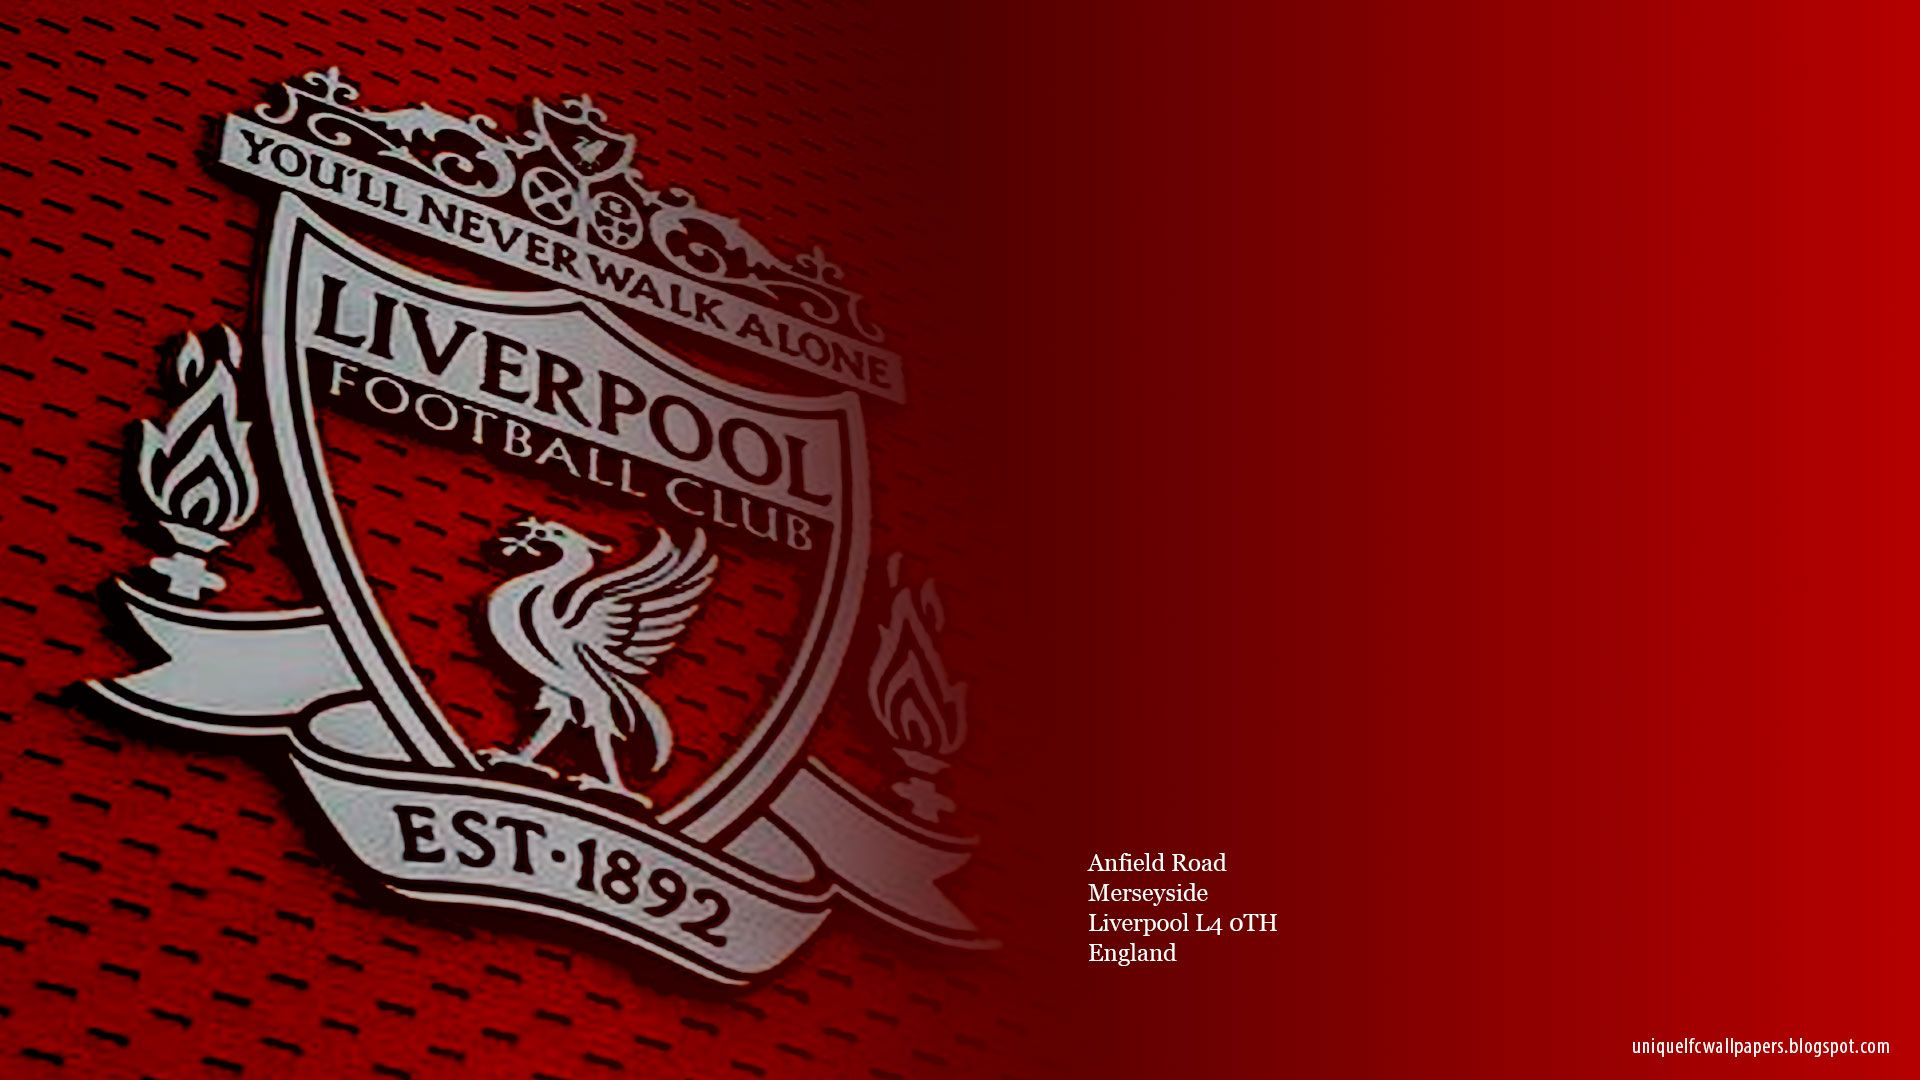 Liverpool Fc Facebook Cover Photo Download Myonlineavenue Com